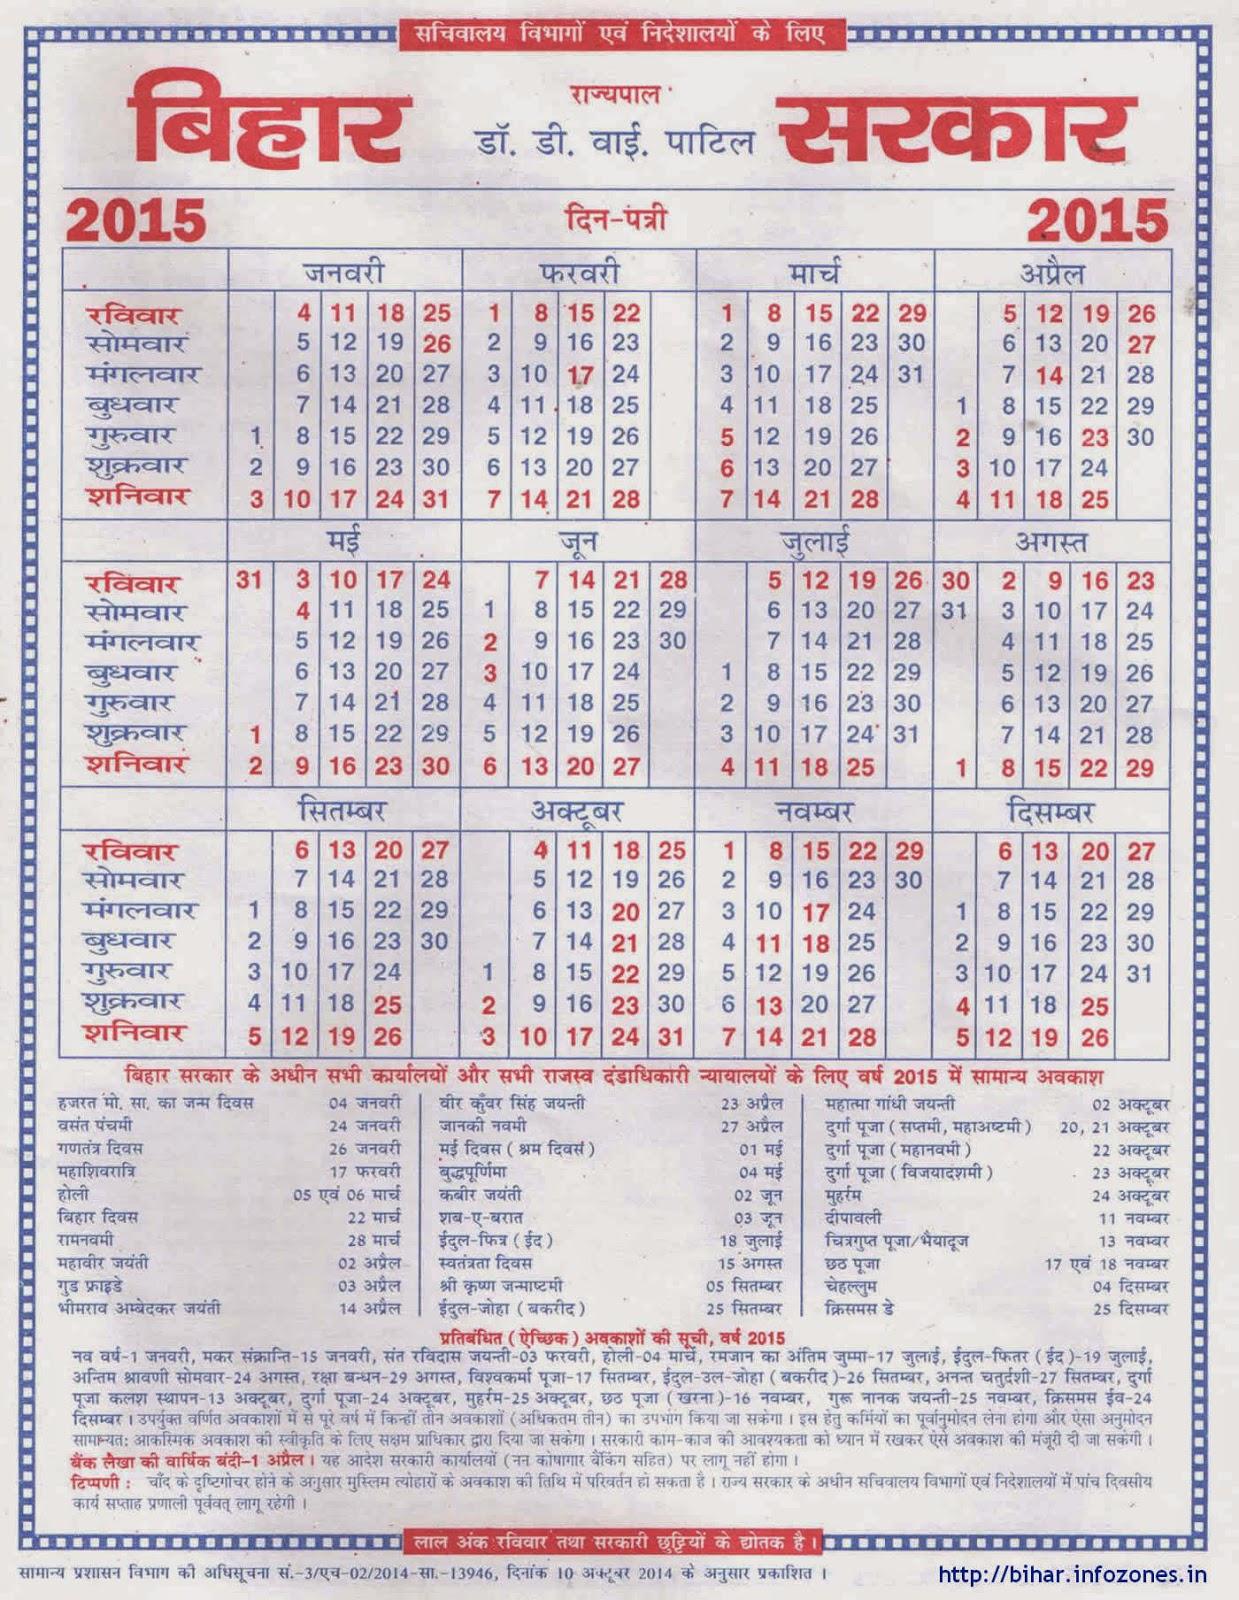 Bihar Government Calendar 2015 in Bihar Sarkar Calender